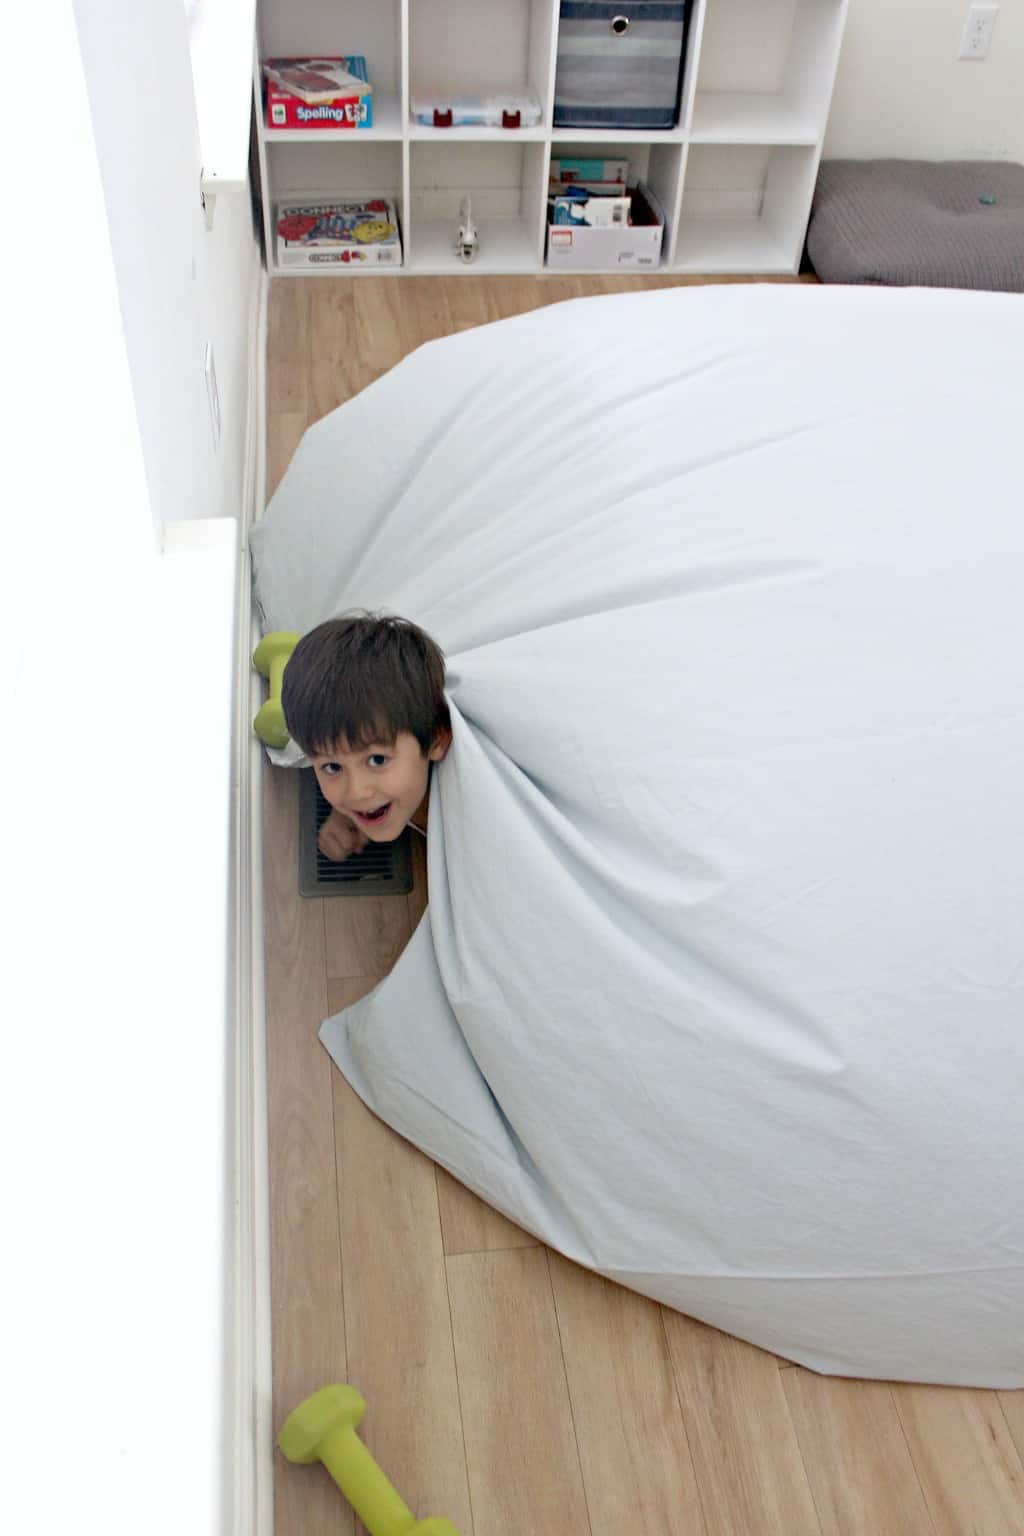 A boy peeking out from under an air fort.